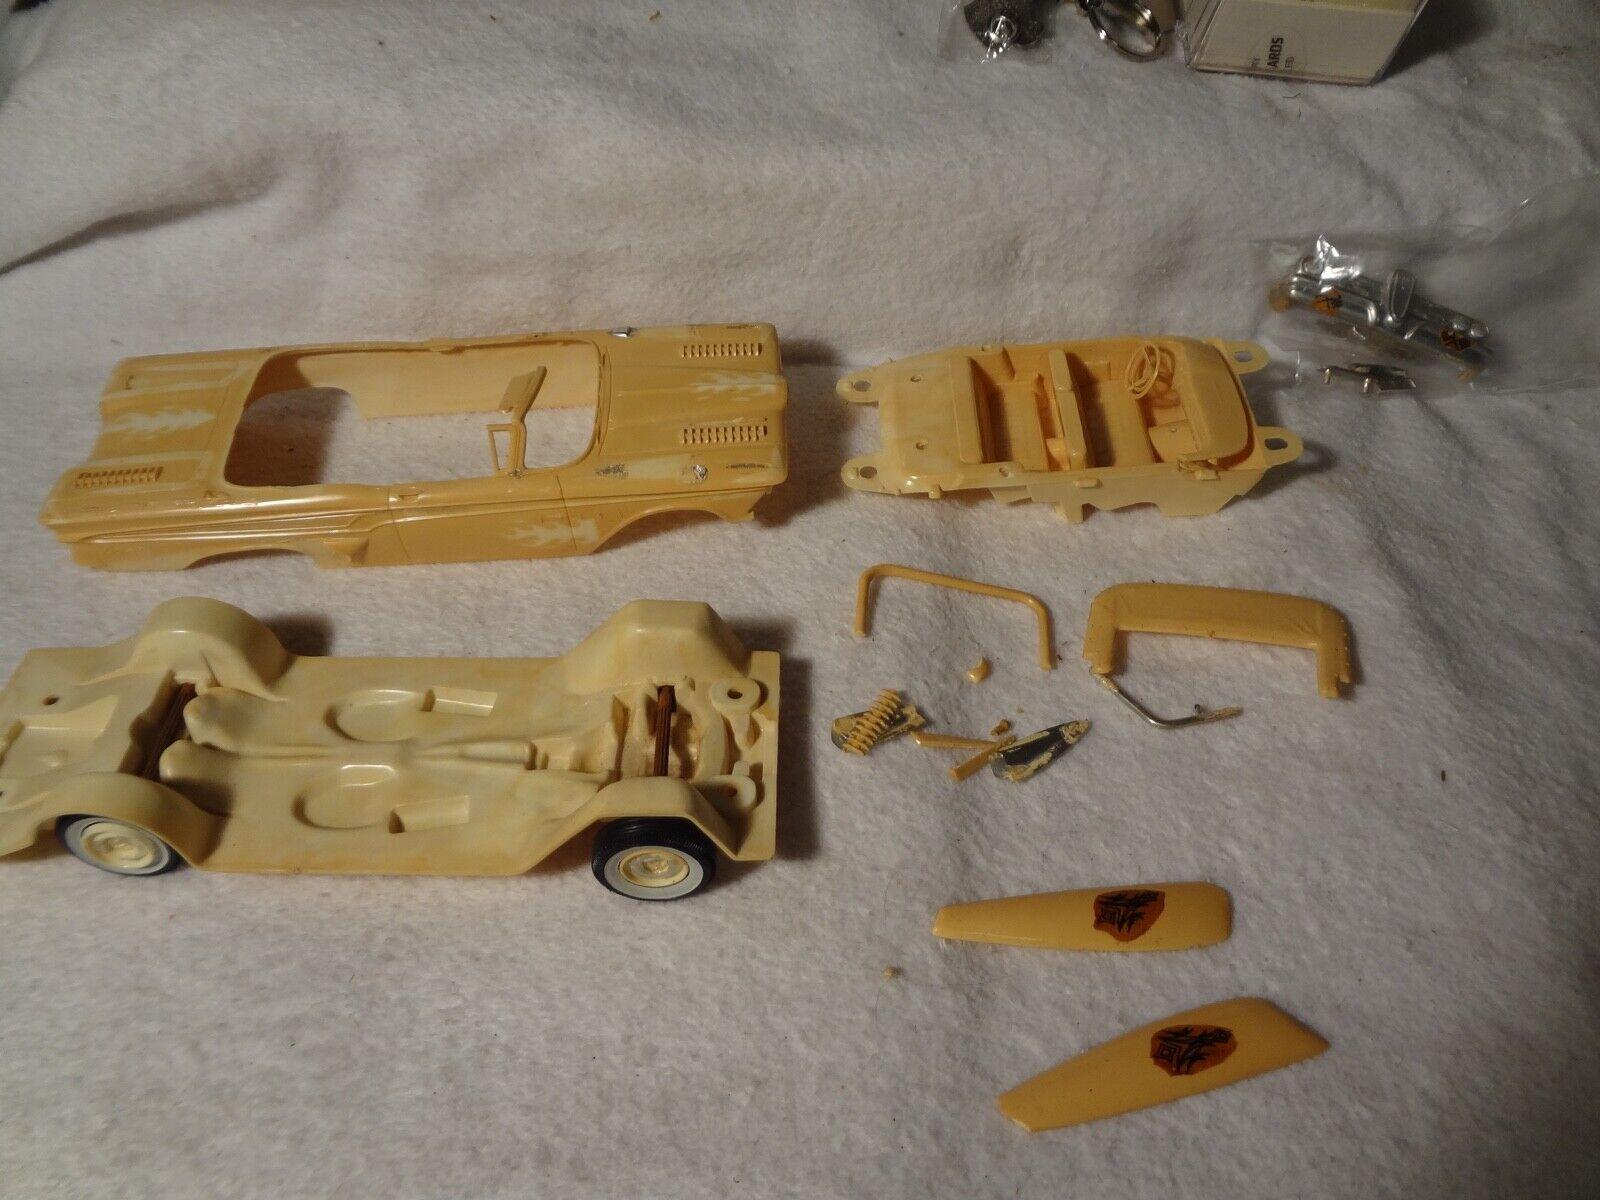 Car Parts - 1959 Edsel Convertible Parts car by AMT